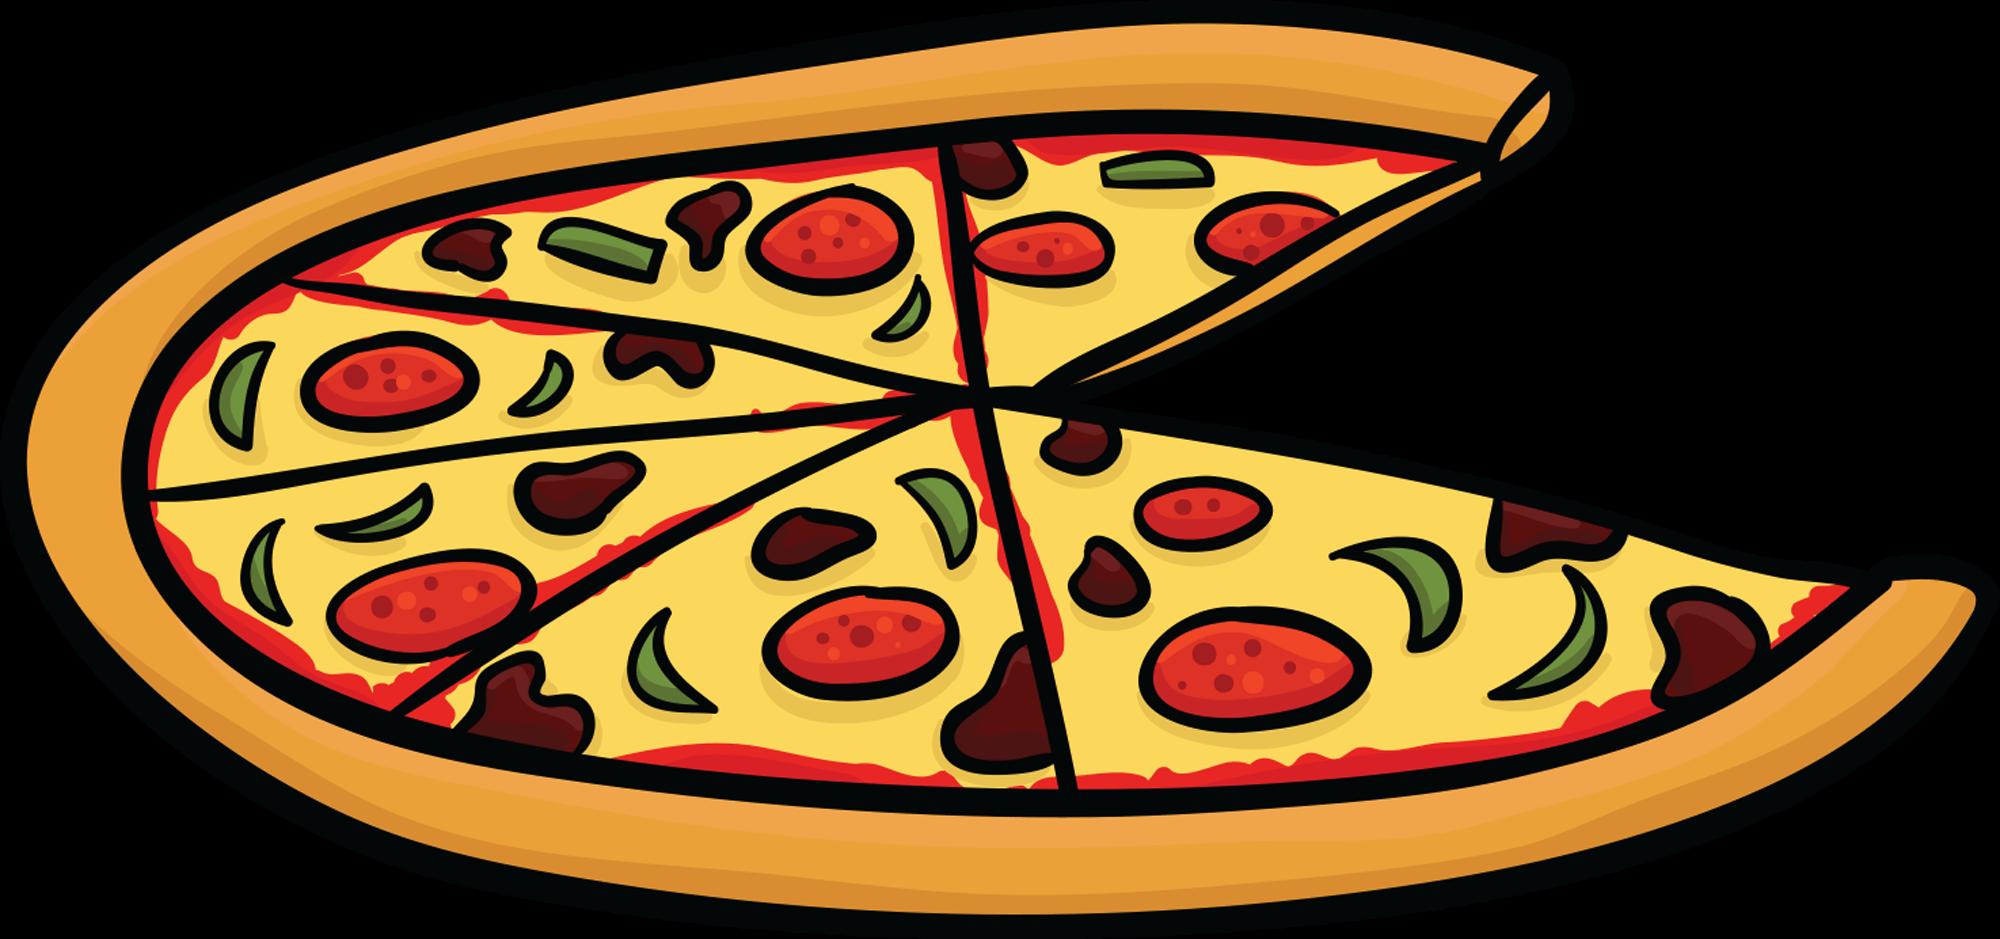 Junk Food Sticker & Emoji Pack for iMessage messages sticker-5